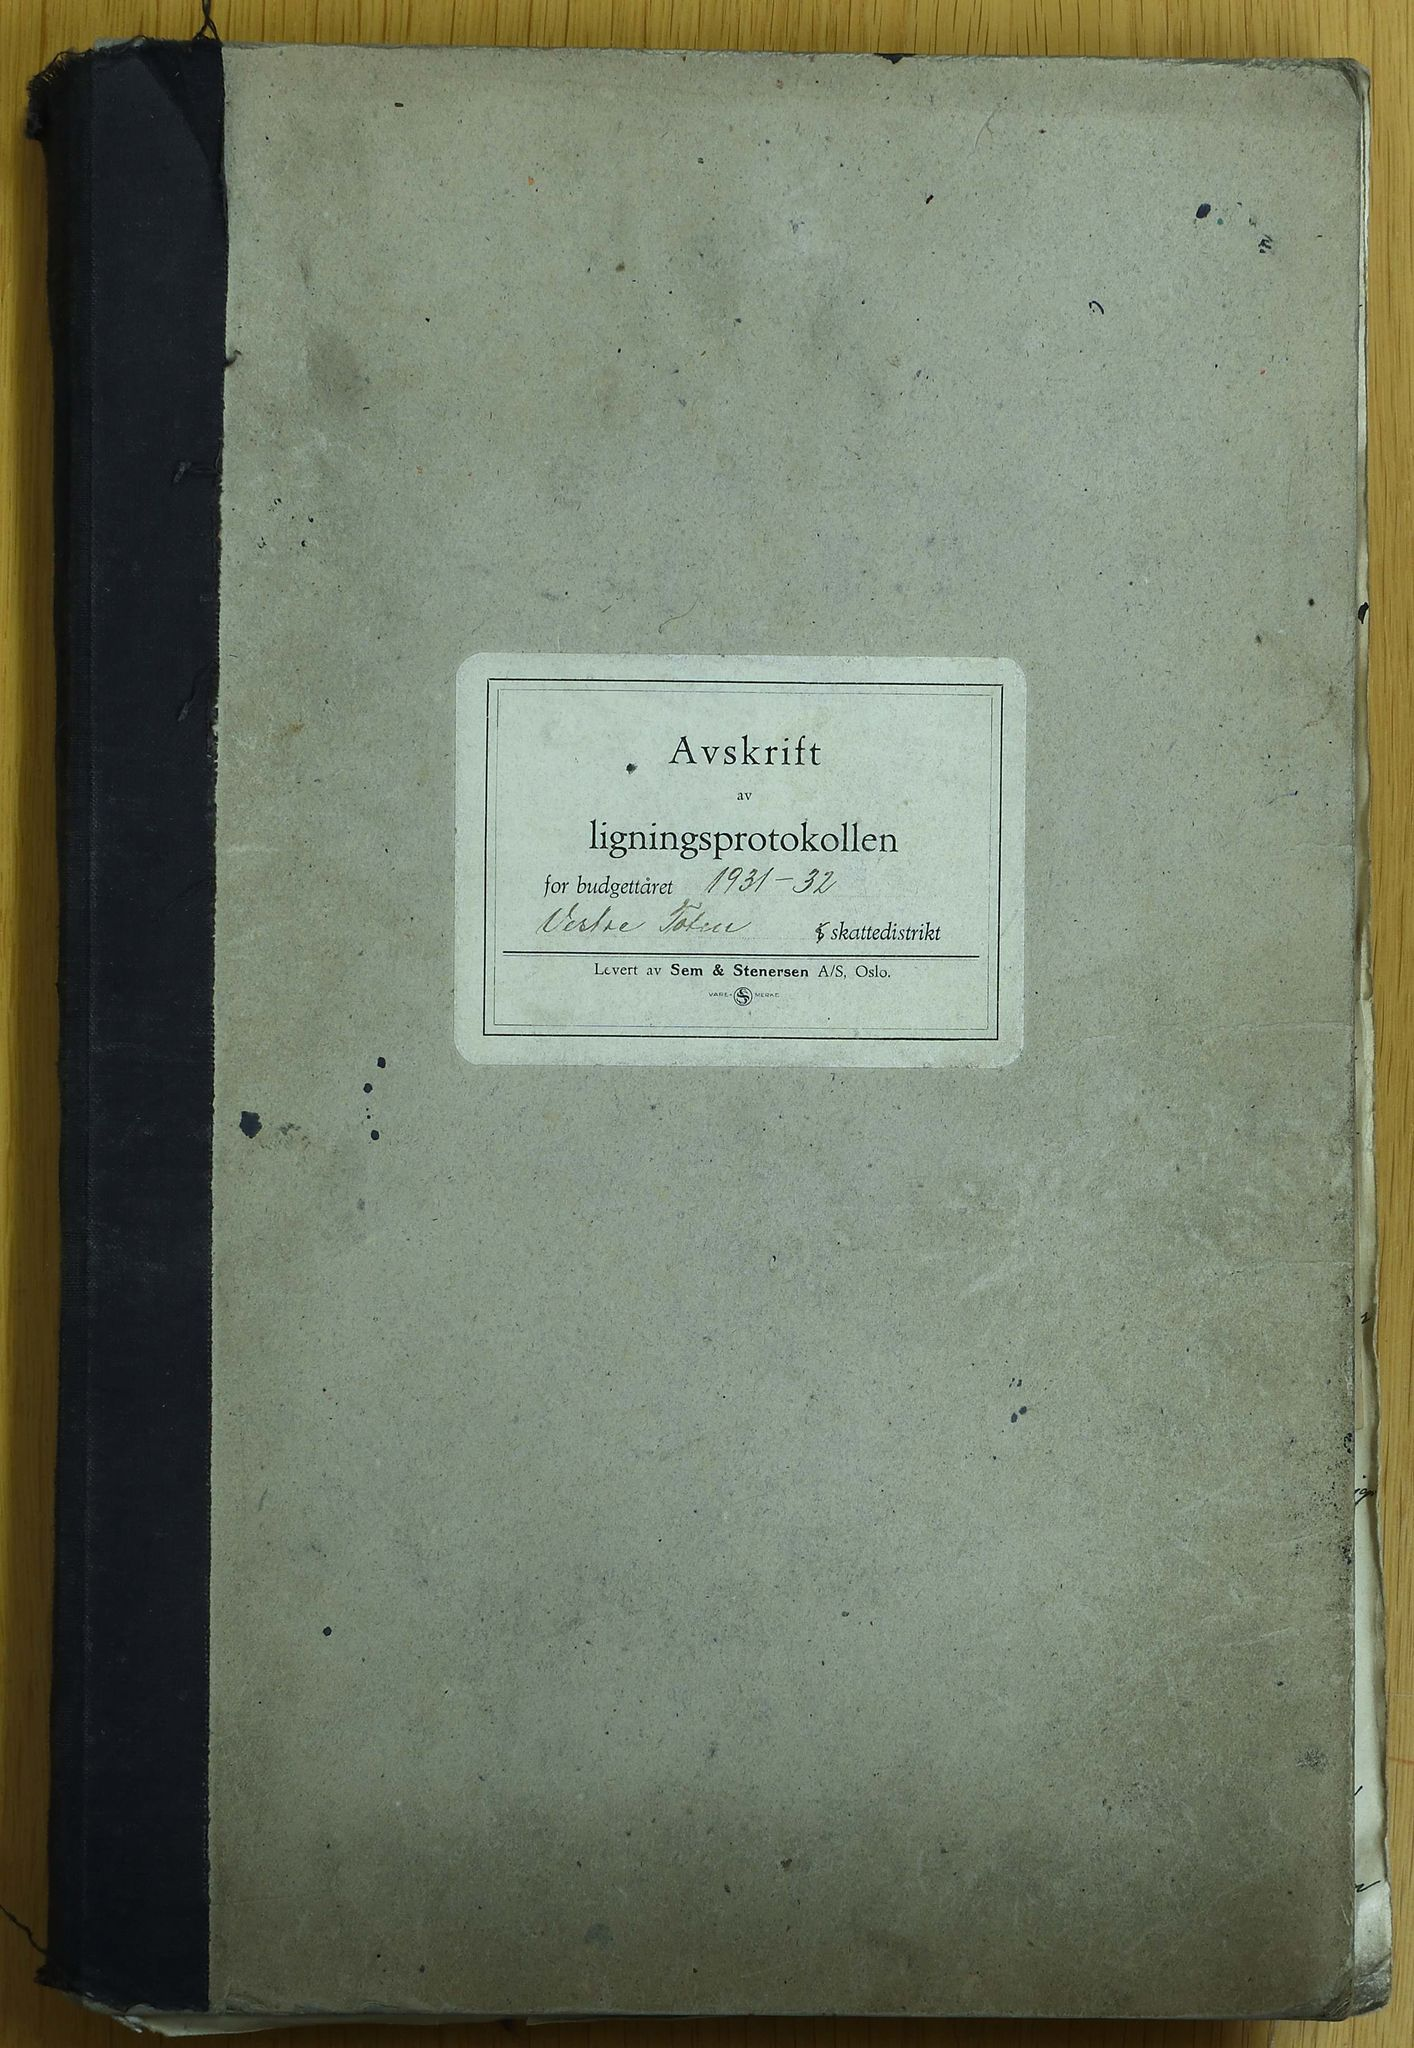 KVT, Vestre Toten kommunearkiv: Avskrift av ligningsprotokollen for budsjettåret 1931-1932 i Vestre Toten skattedistrikt, 1931-1932